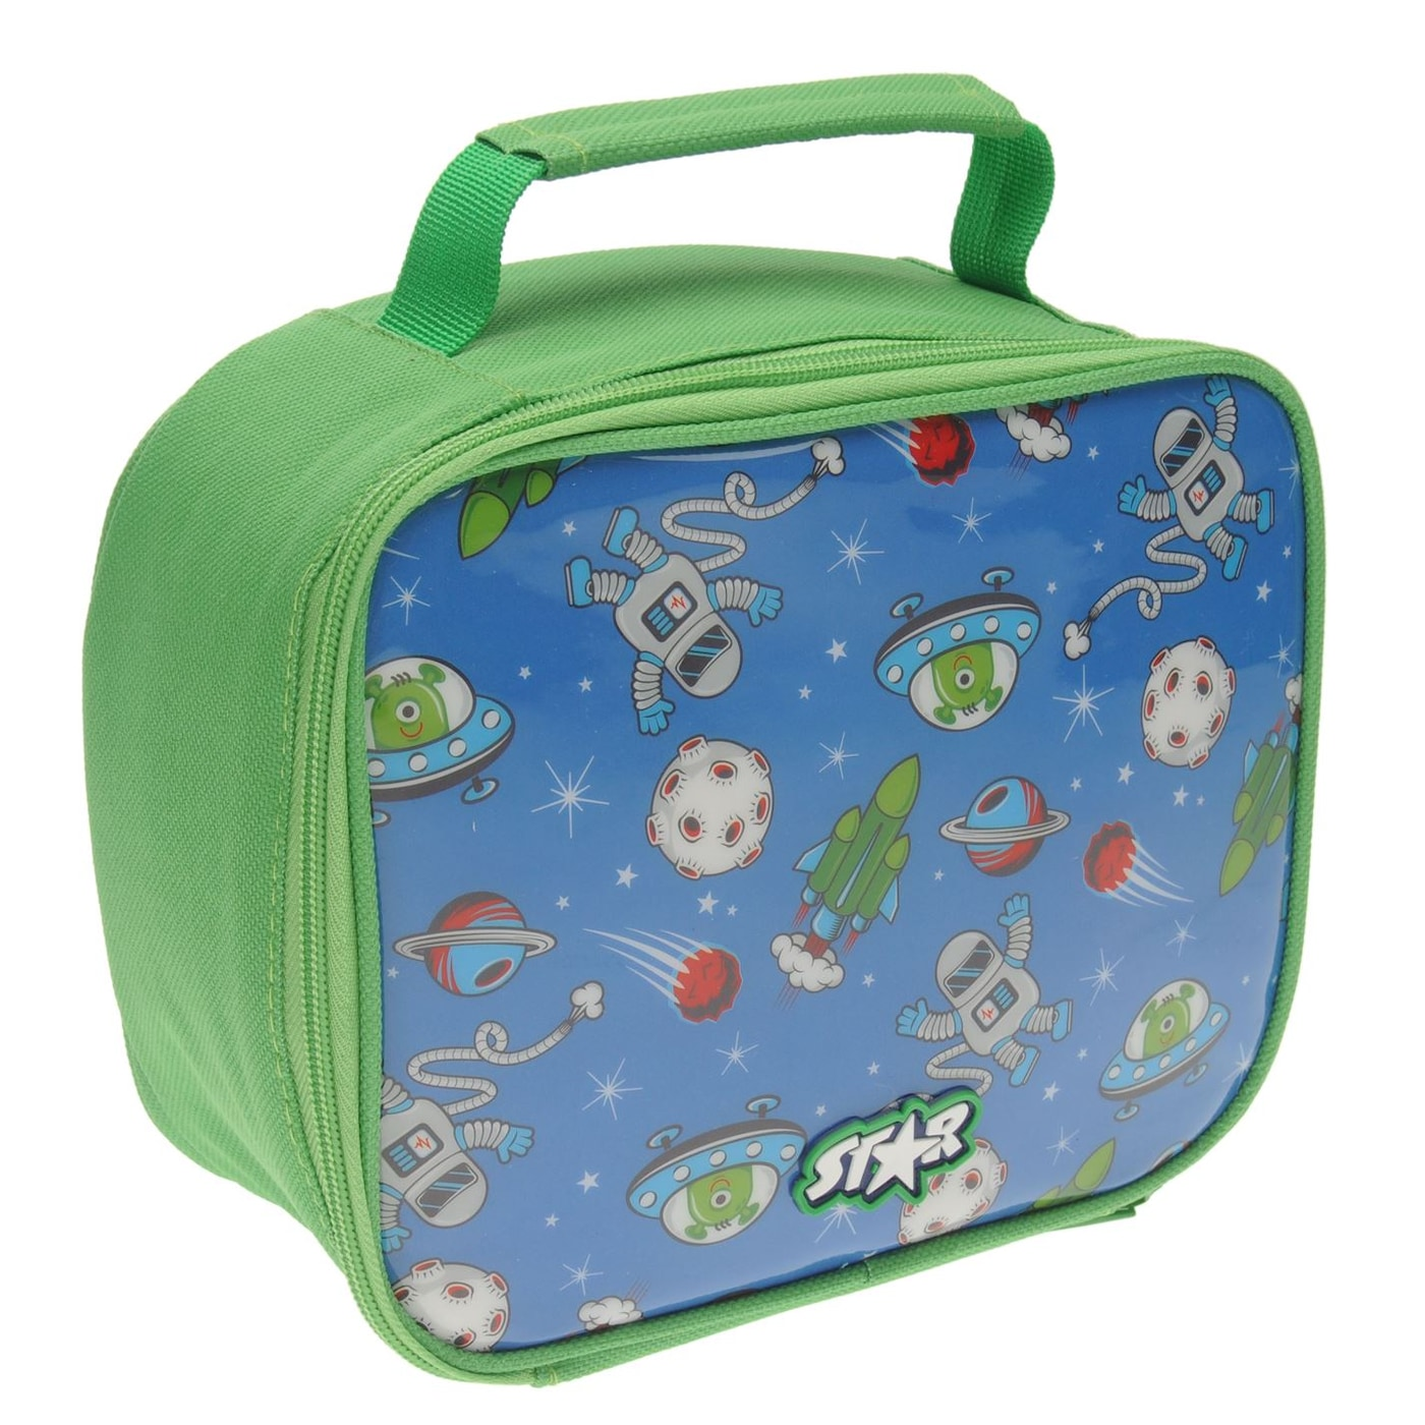 Star Lunch Bag Unisex Childrens